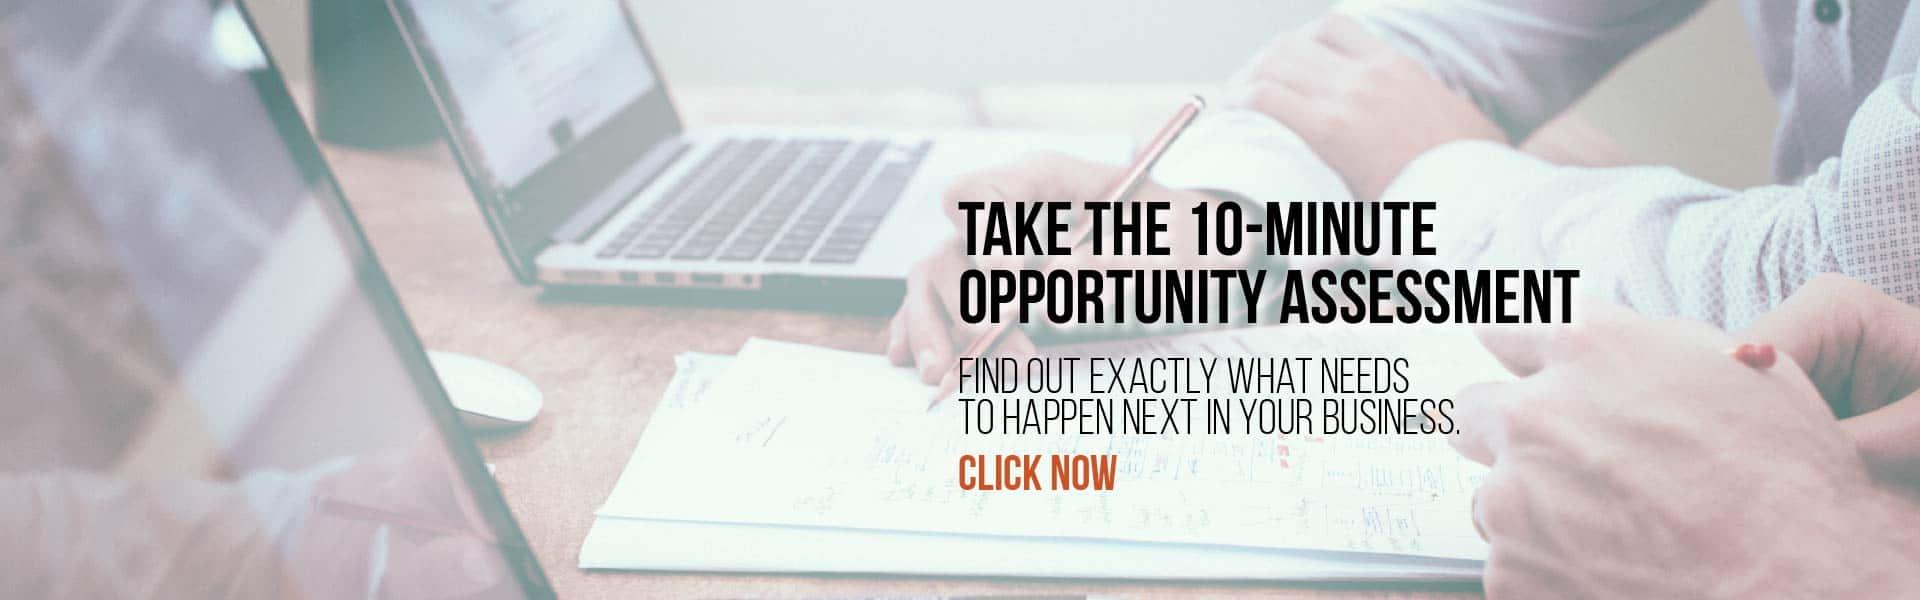 10 Minute Assessment, Rhapsody Strategies, Business Coaching, Business Coach, Life Coach